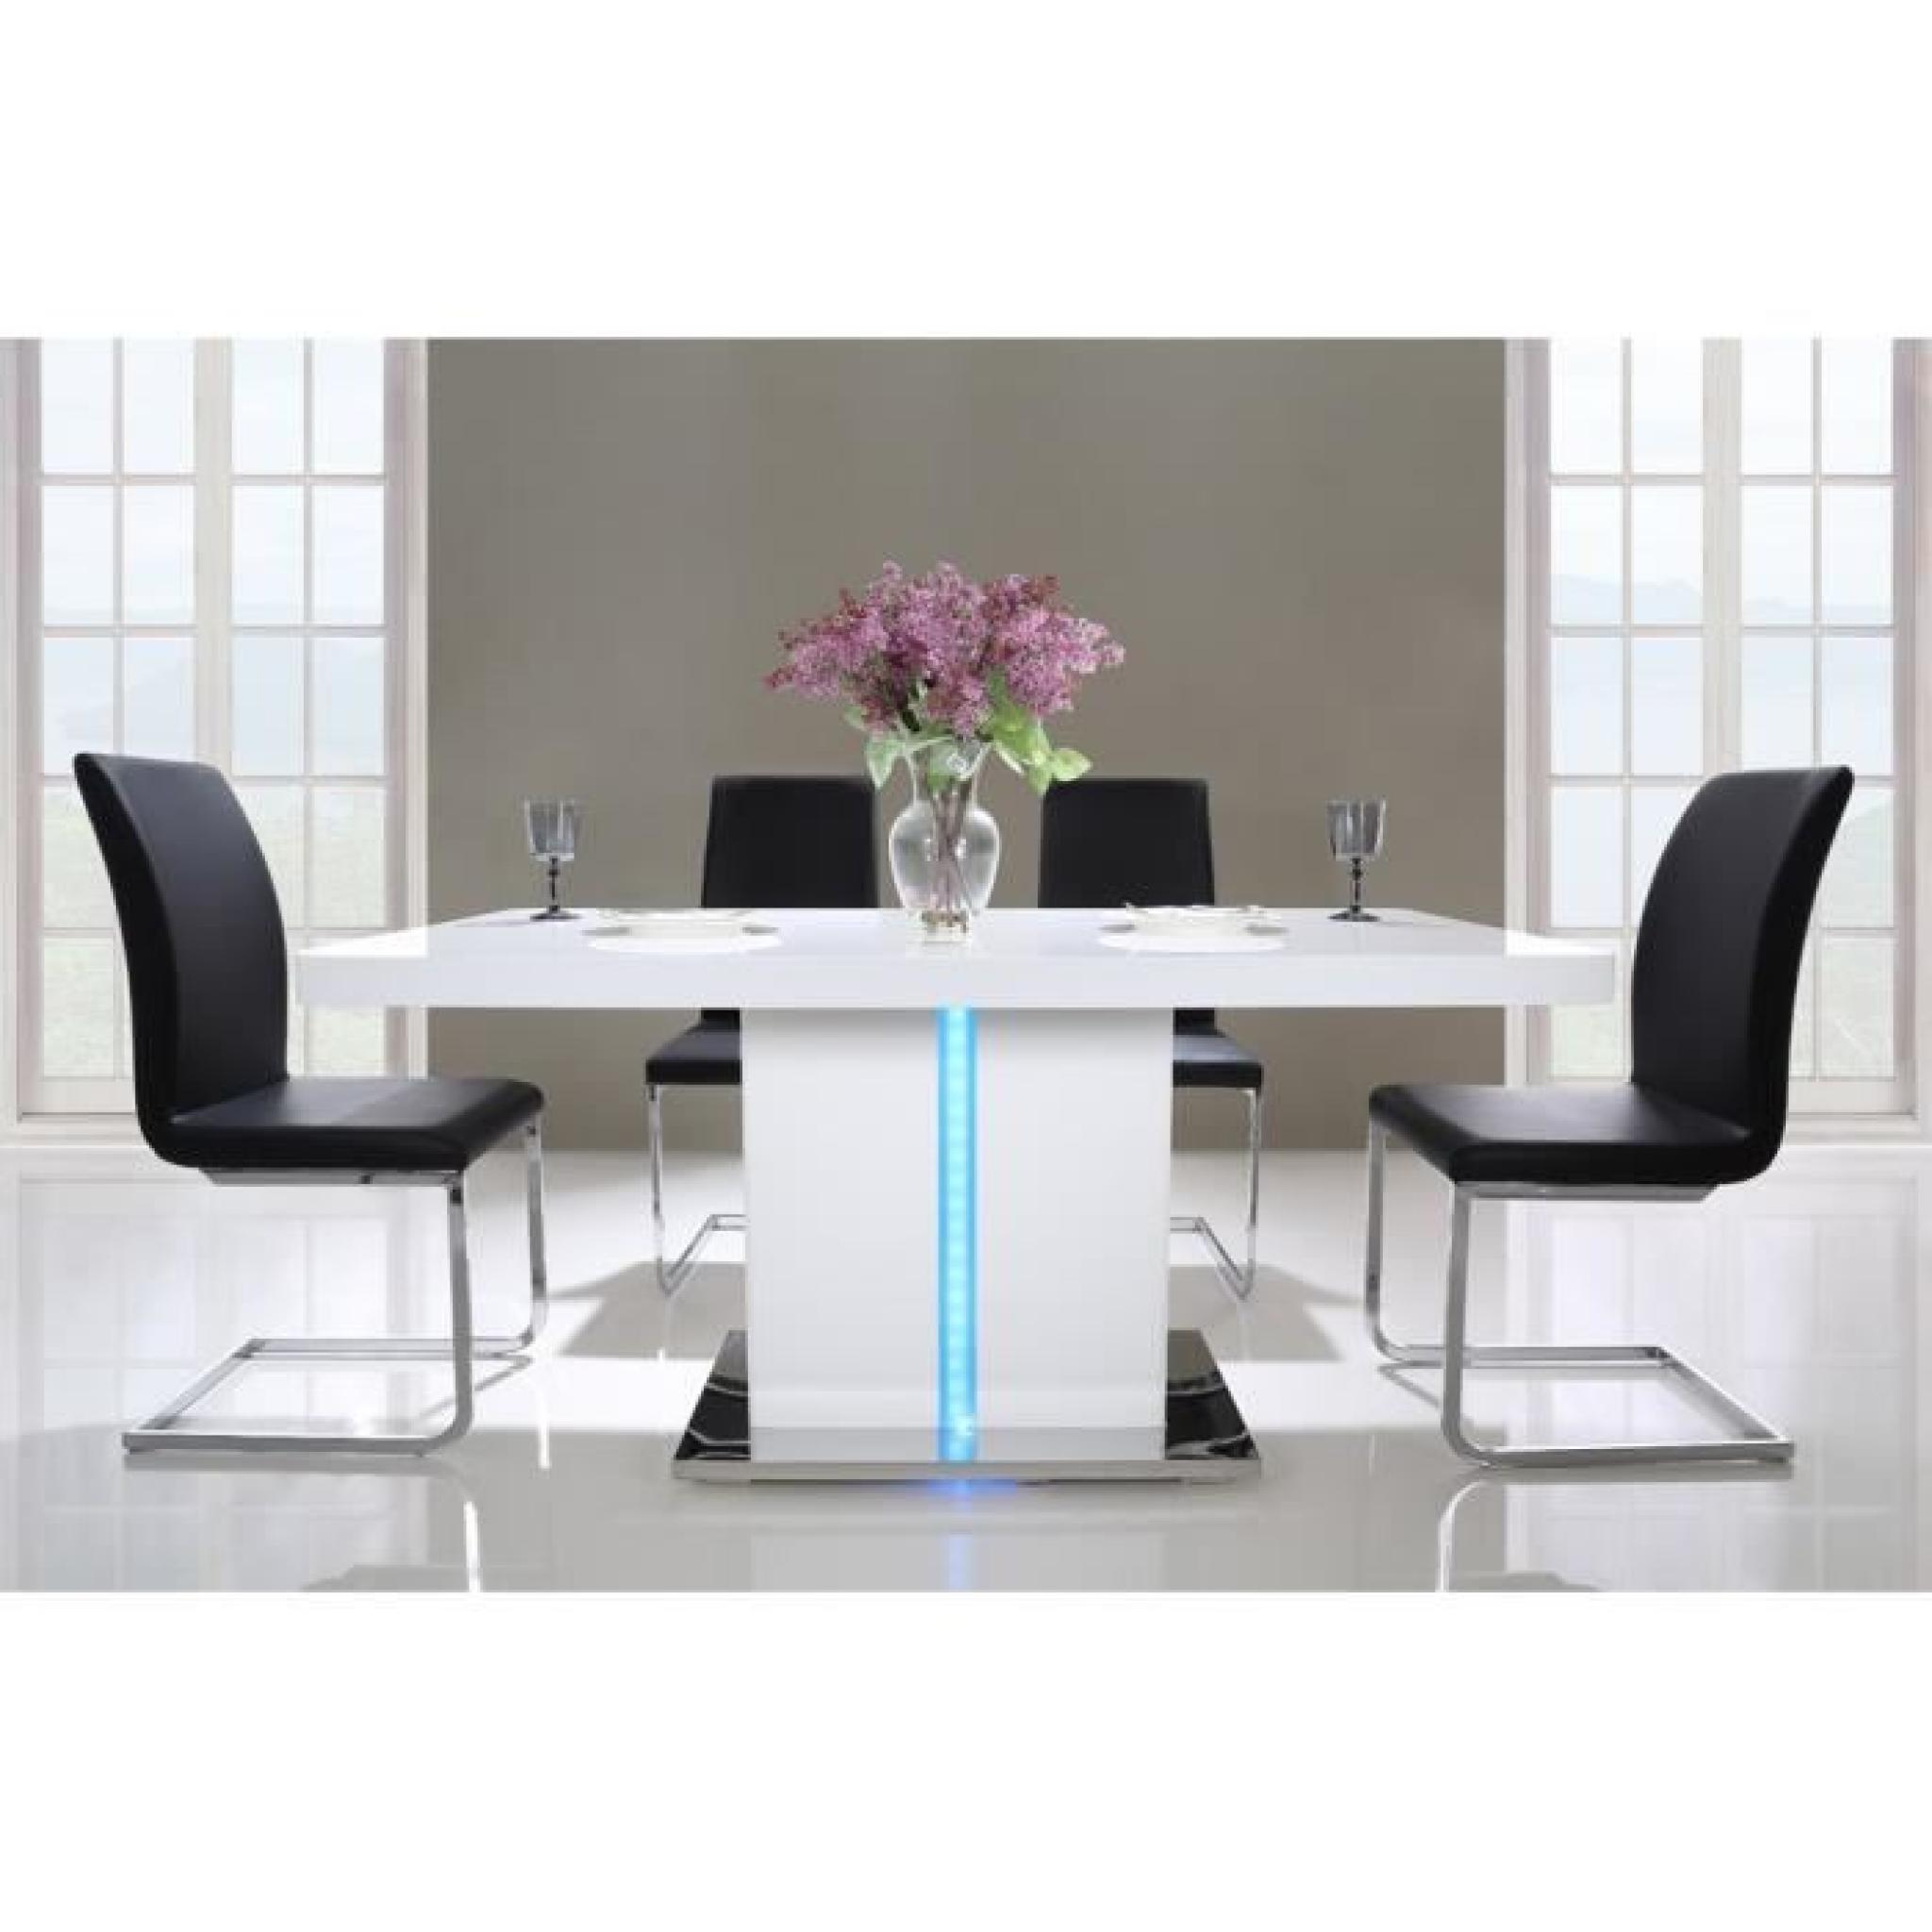 LASER Table Manger 160cm Laqu Blanc Brillant Avec LED